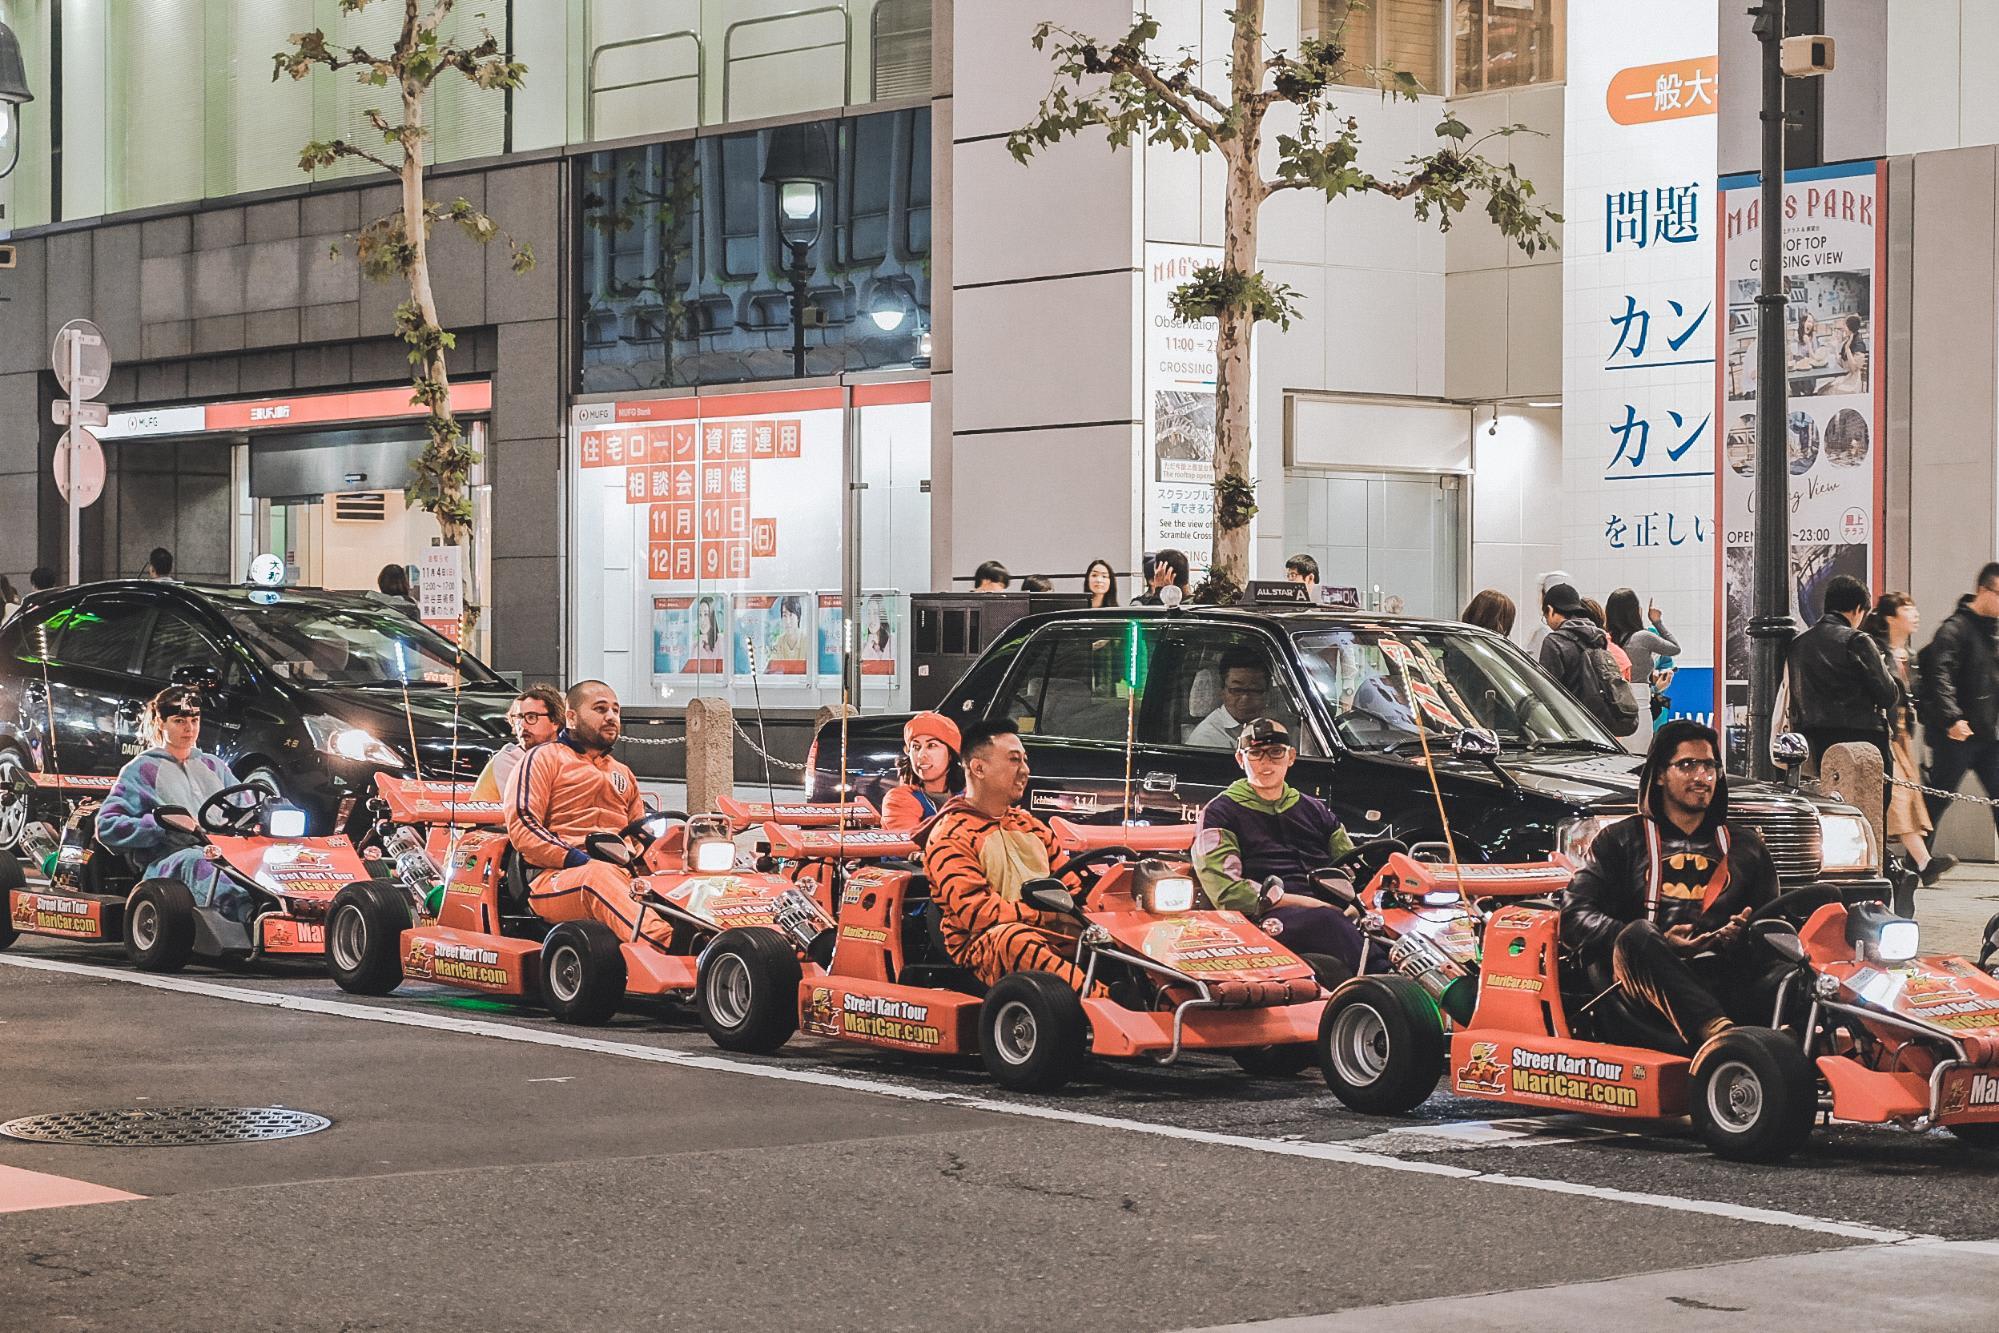 xe go-kart tại tokyo